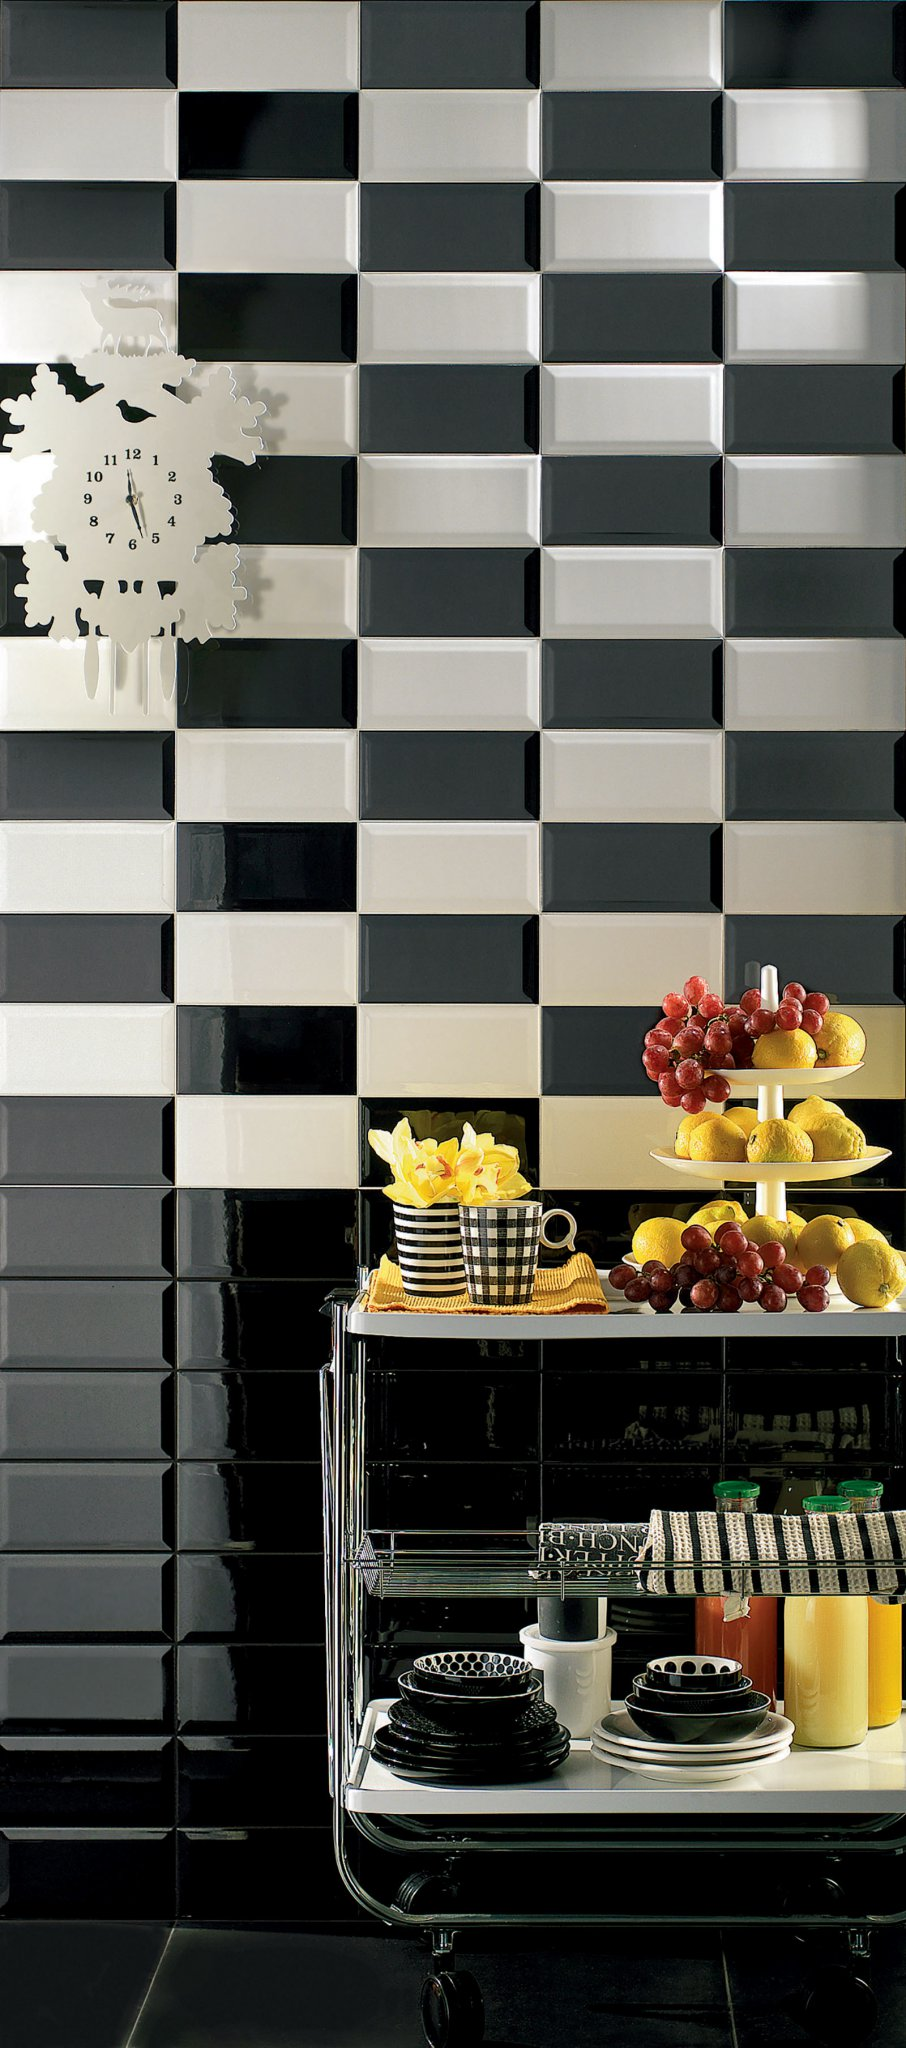 Diamante rivestimento cucina nero mosaico armonie ceramiche - Mosaico rivestimento cucina ...